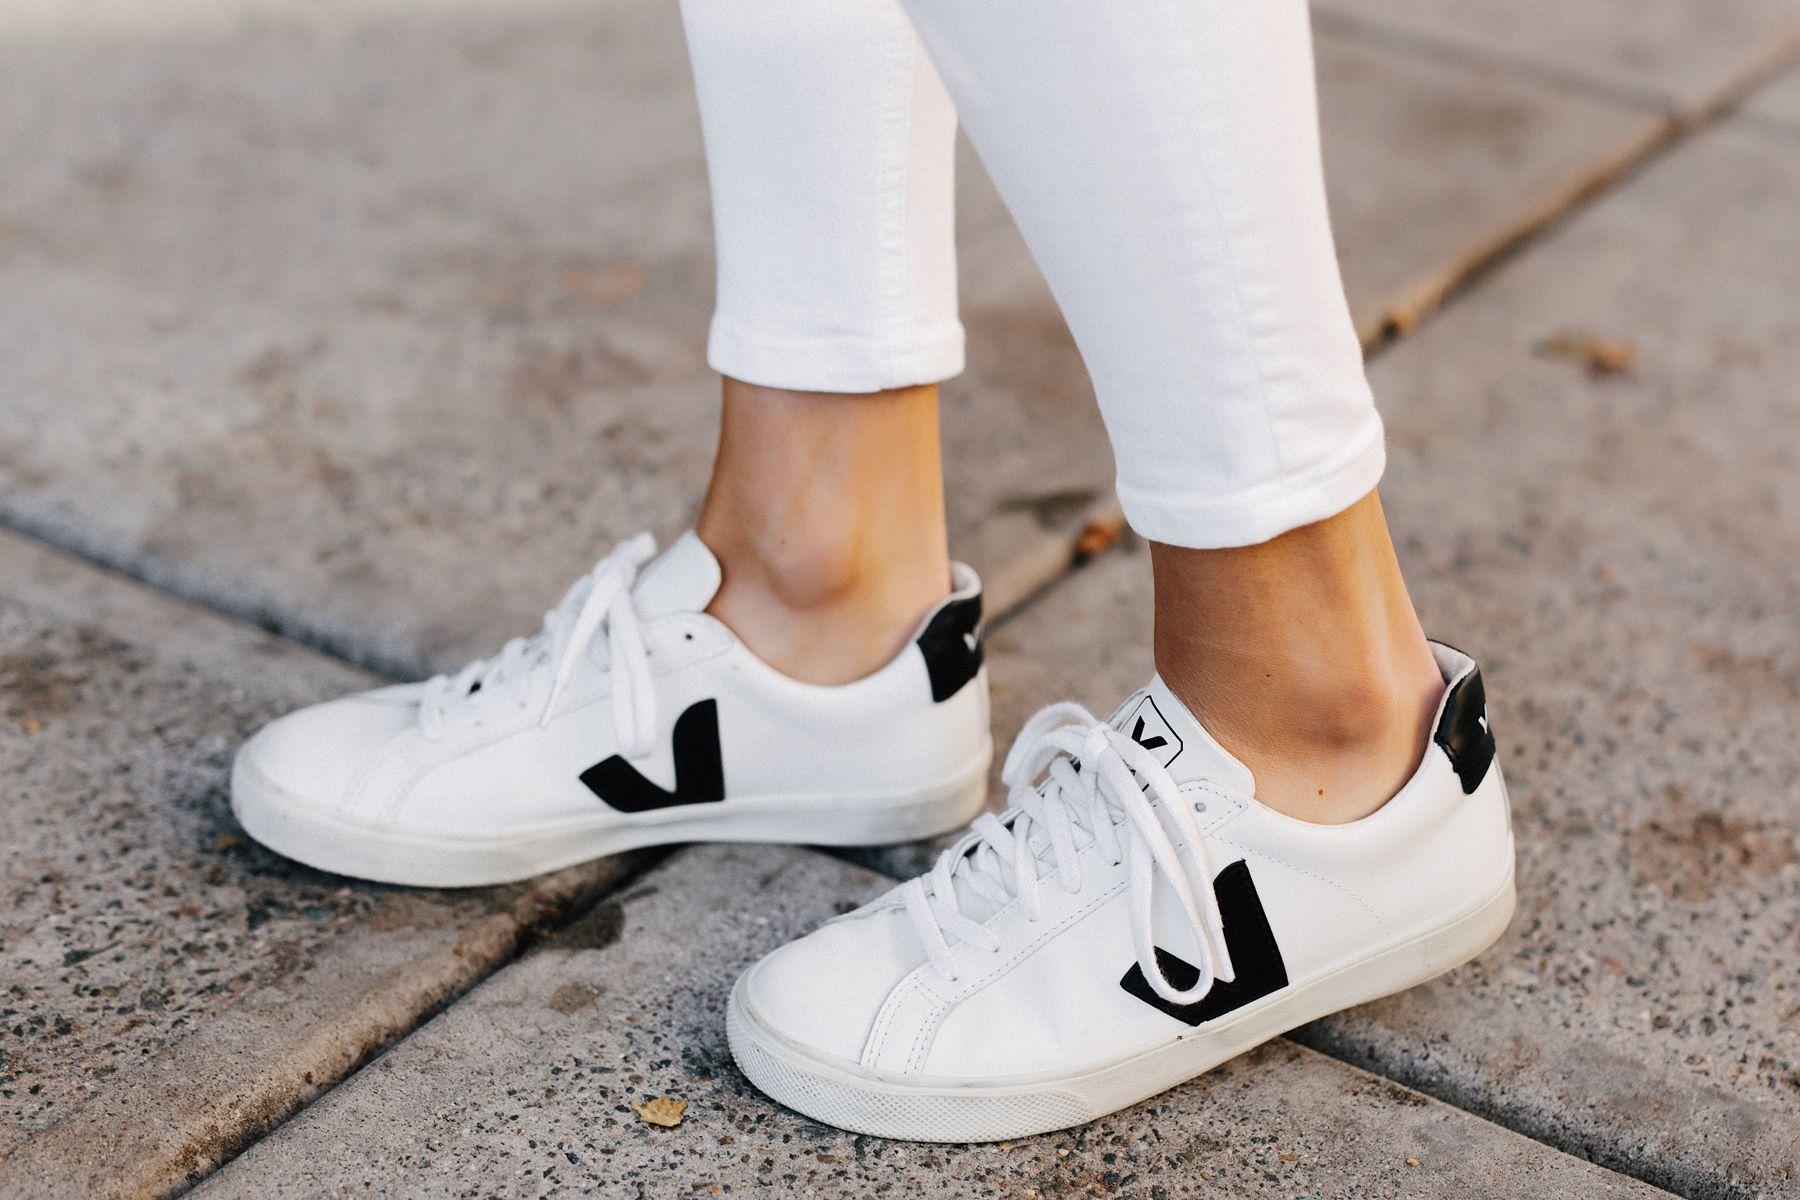 White sneakers women, Sneakers fashion